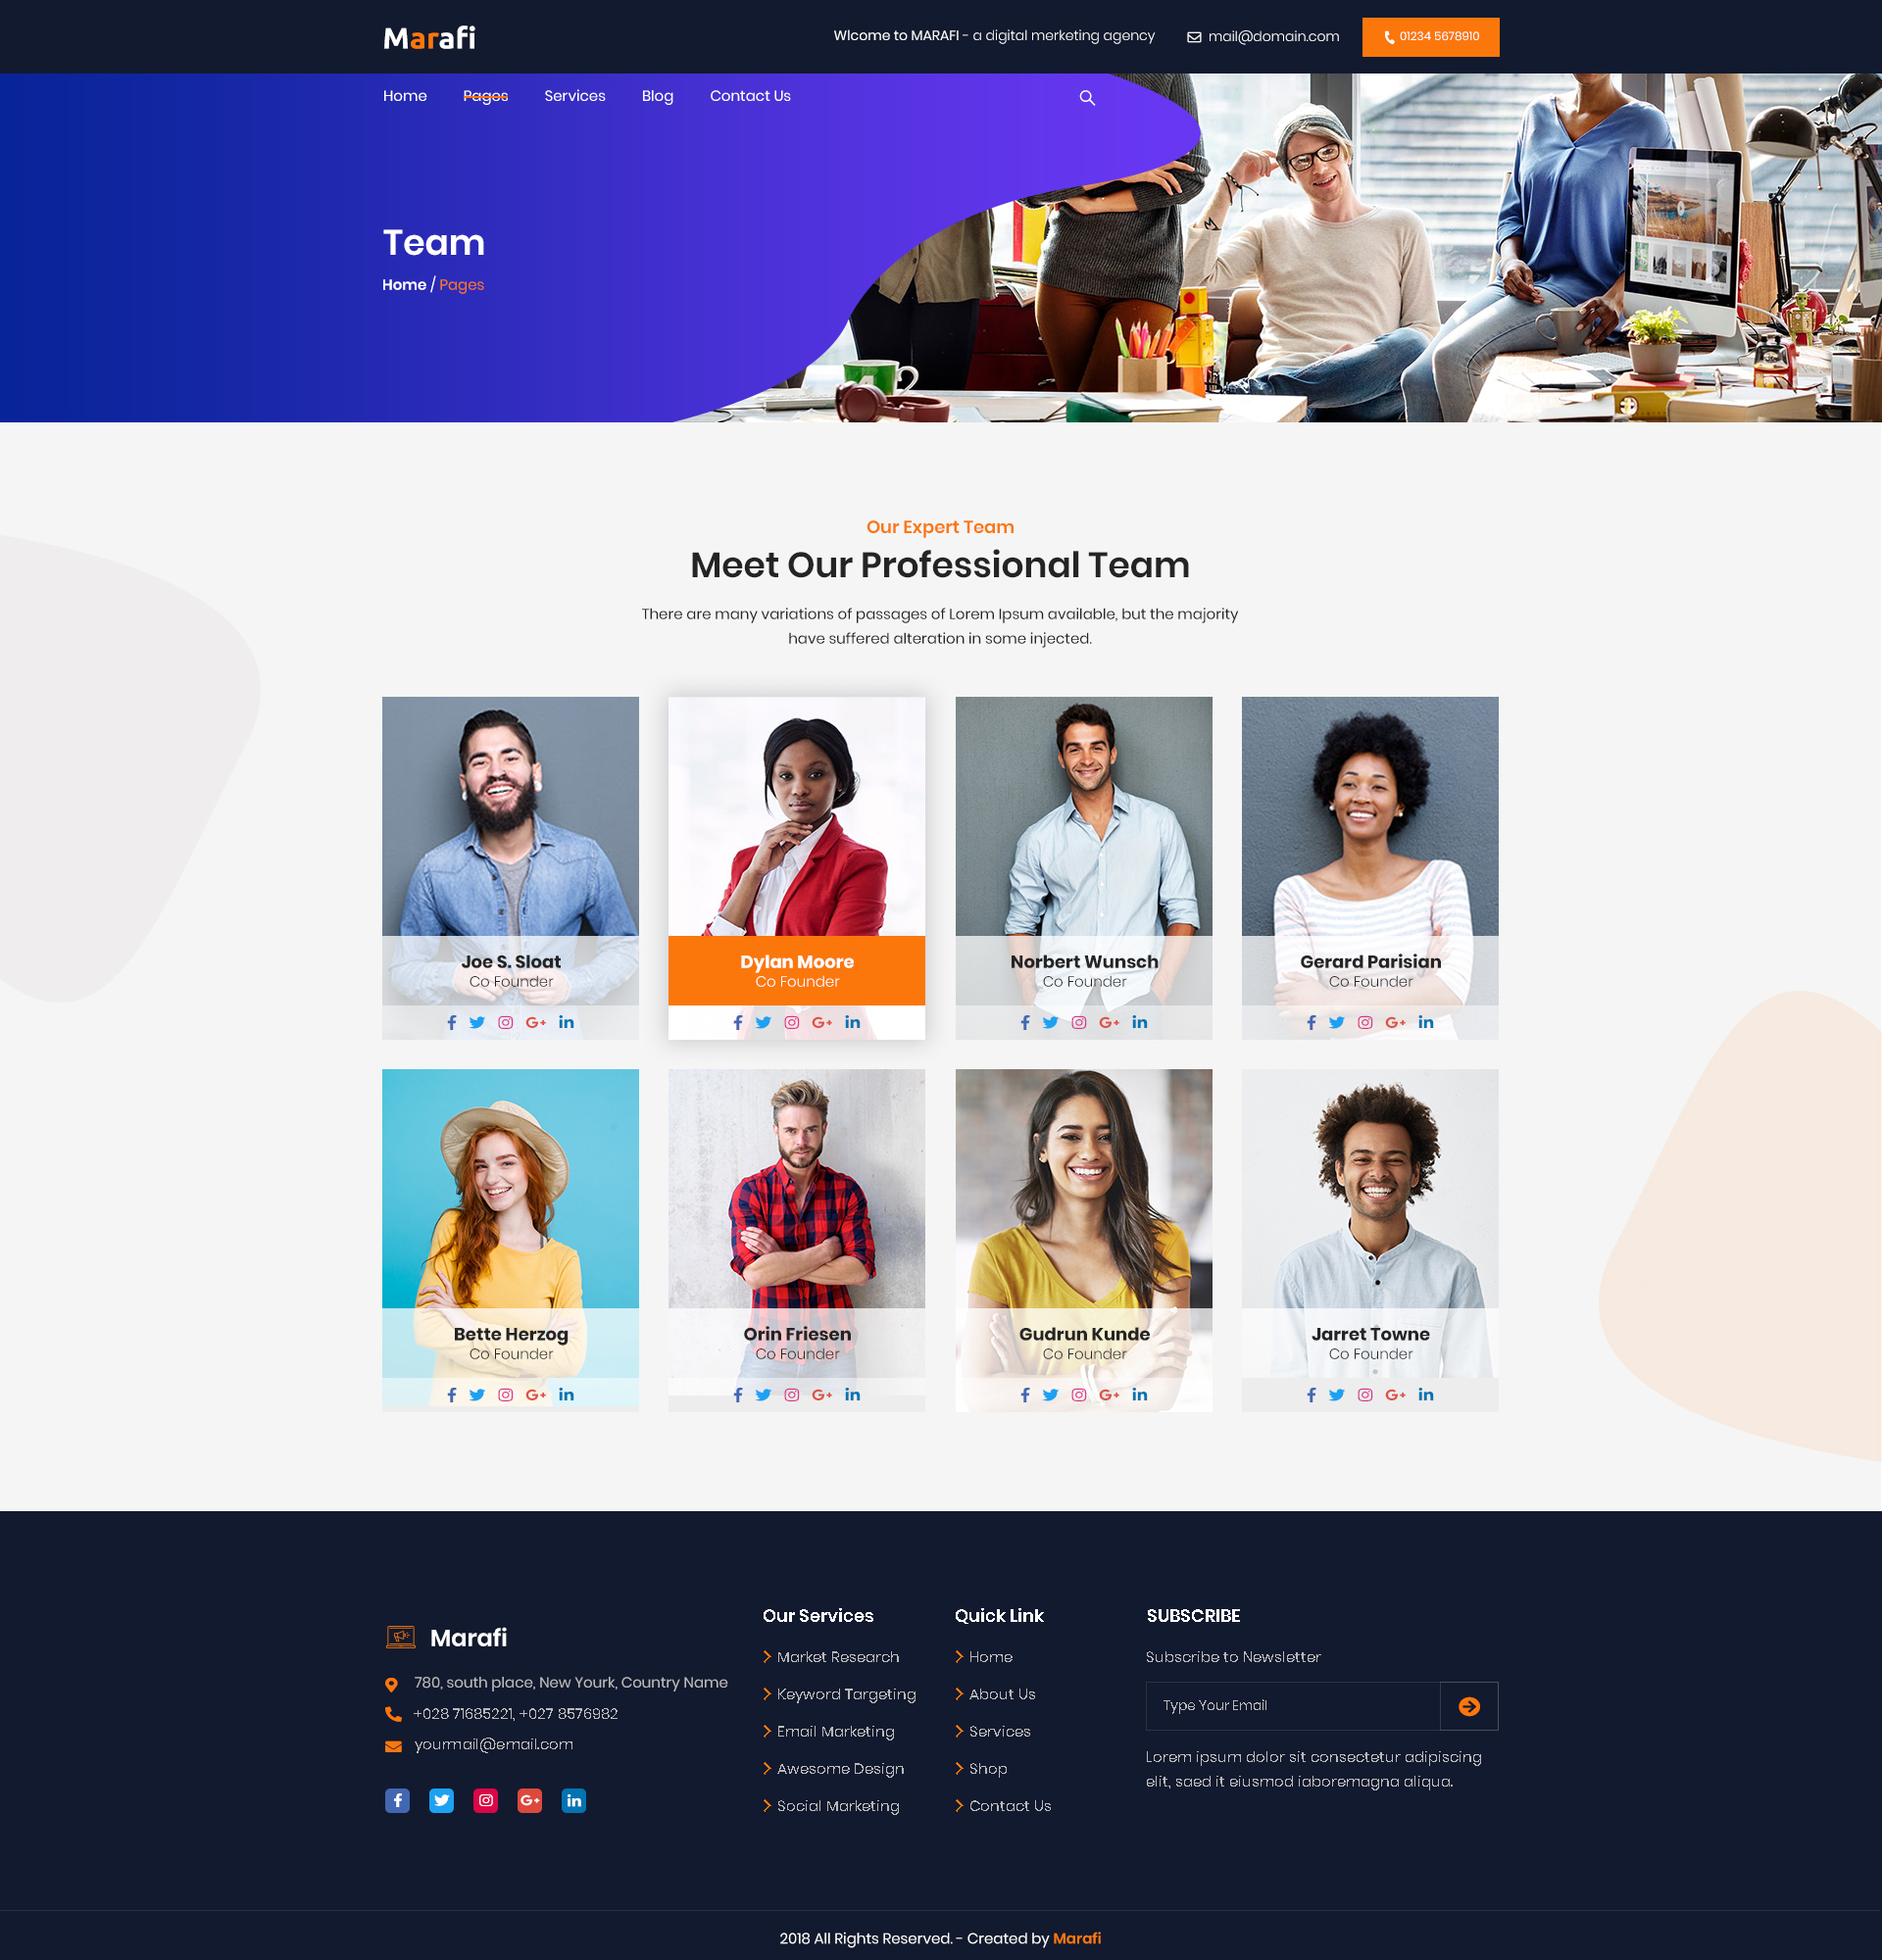 Marafi - Digital Marketing Agency PSD Template